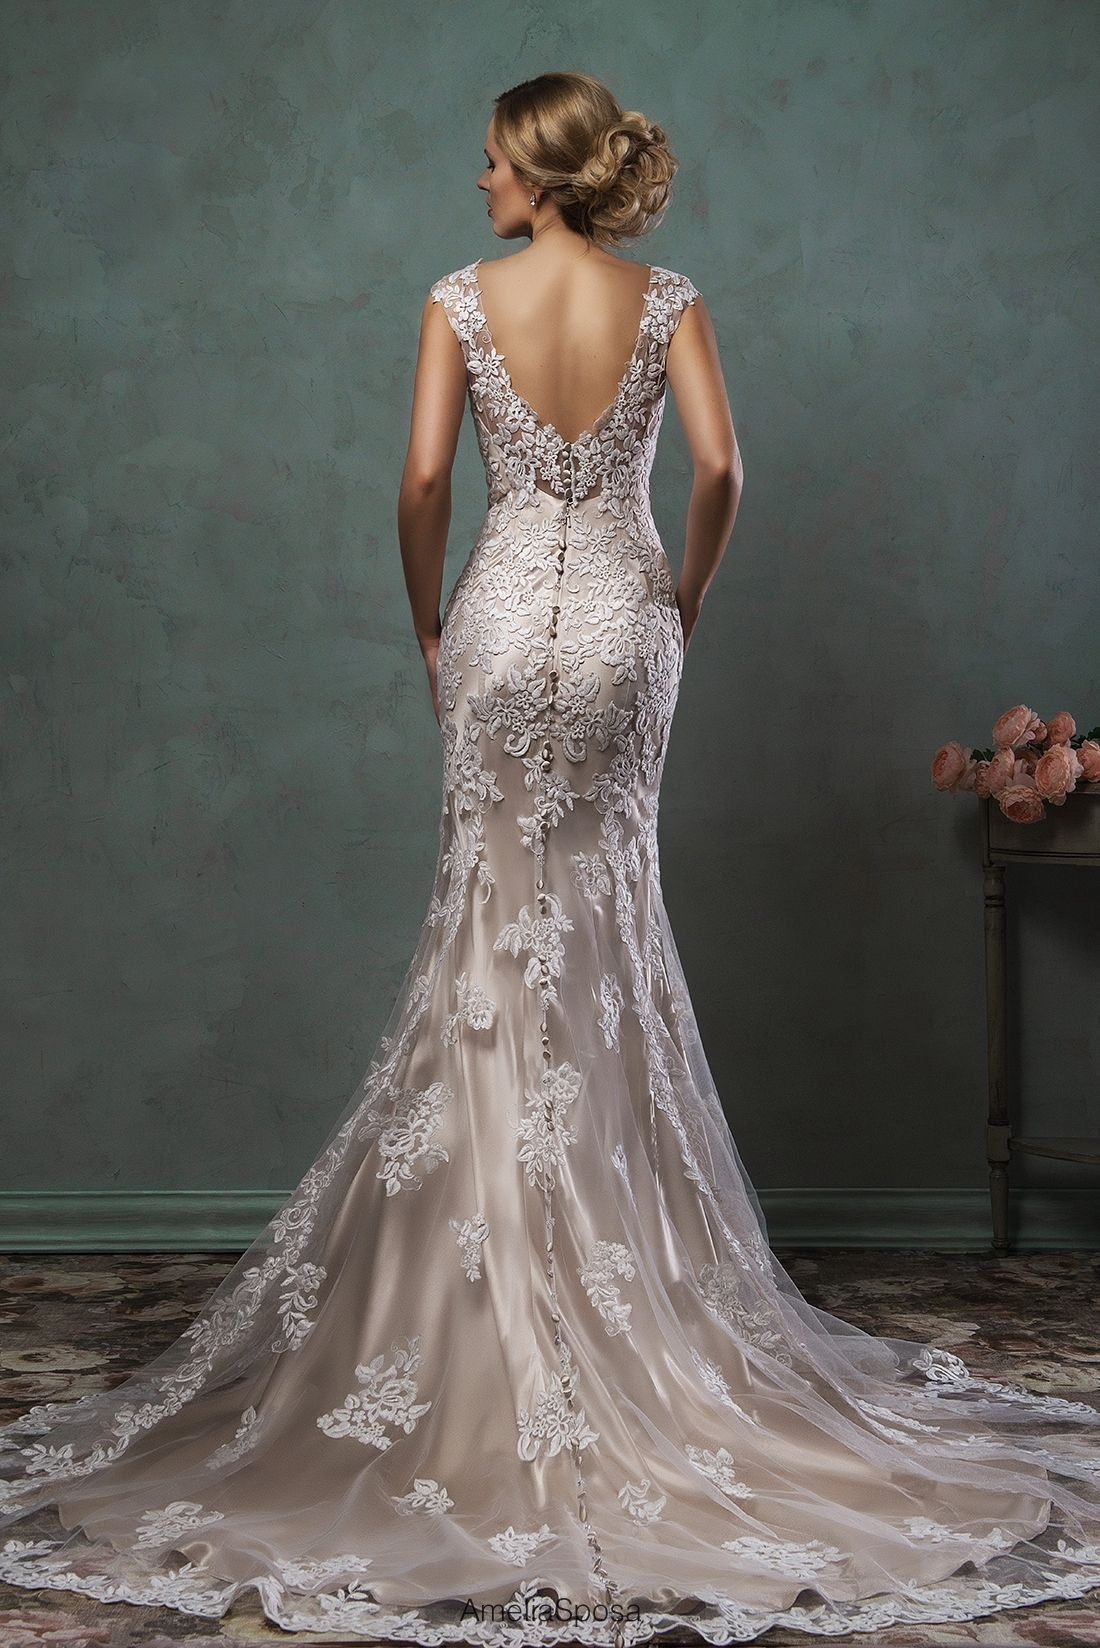 Pin By Priya Avi Sasi On Longos Amelia Sposa Wedding Dress Wedding Dress Cap Sleeves Wedding Dresses Lace